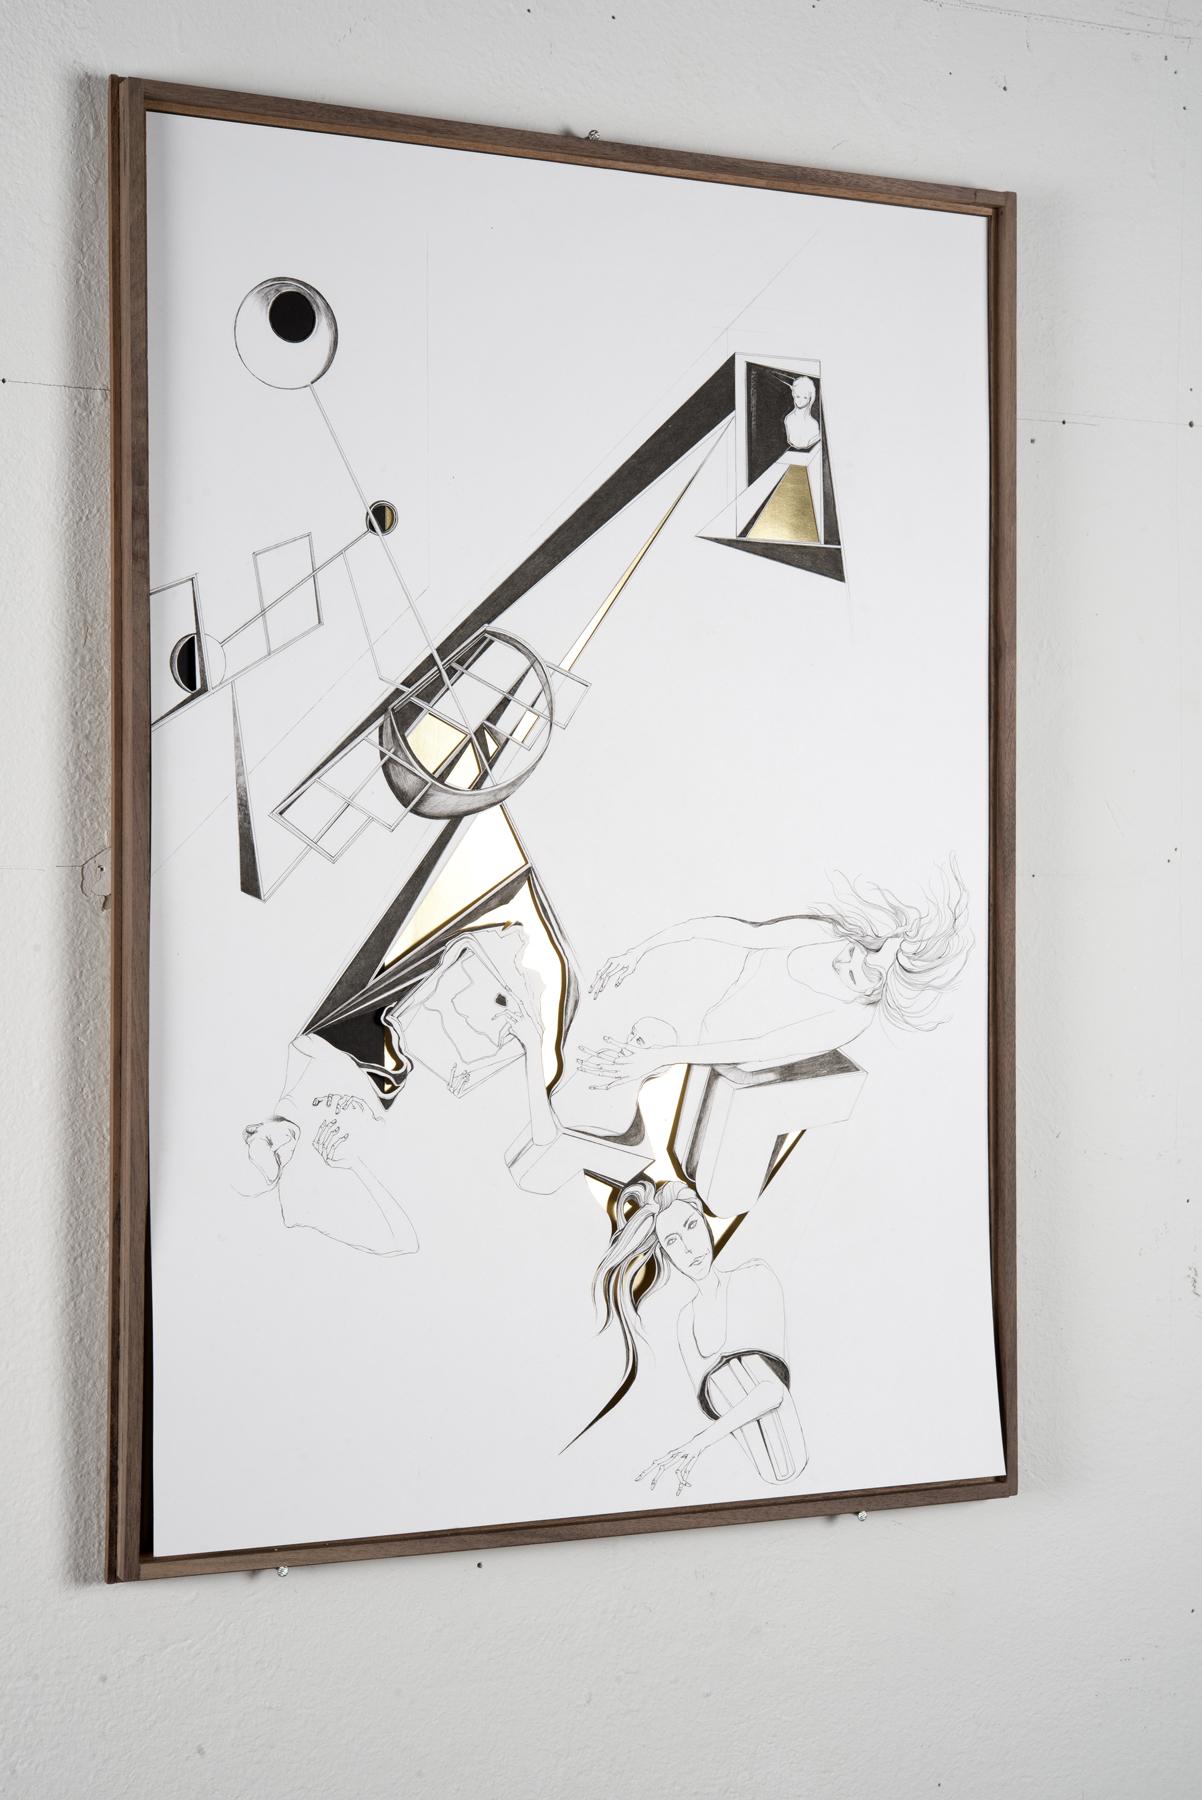 Nina Annabelle Märkl | Modell Nummer 3 | Ink on paper, cut outs, black paper, brass | 59 x 42 cm